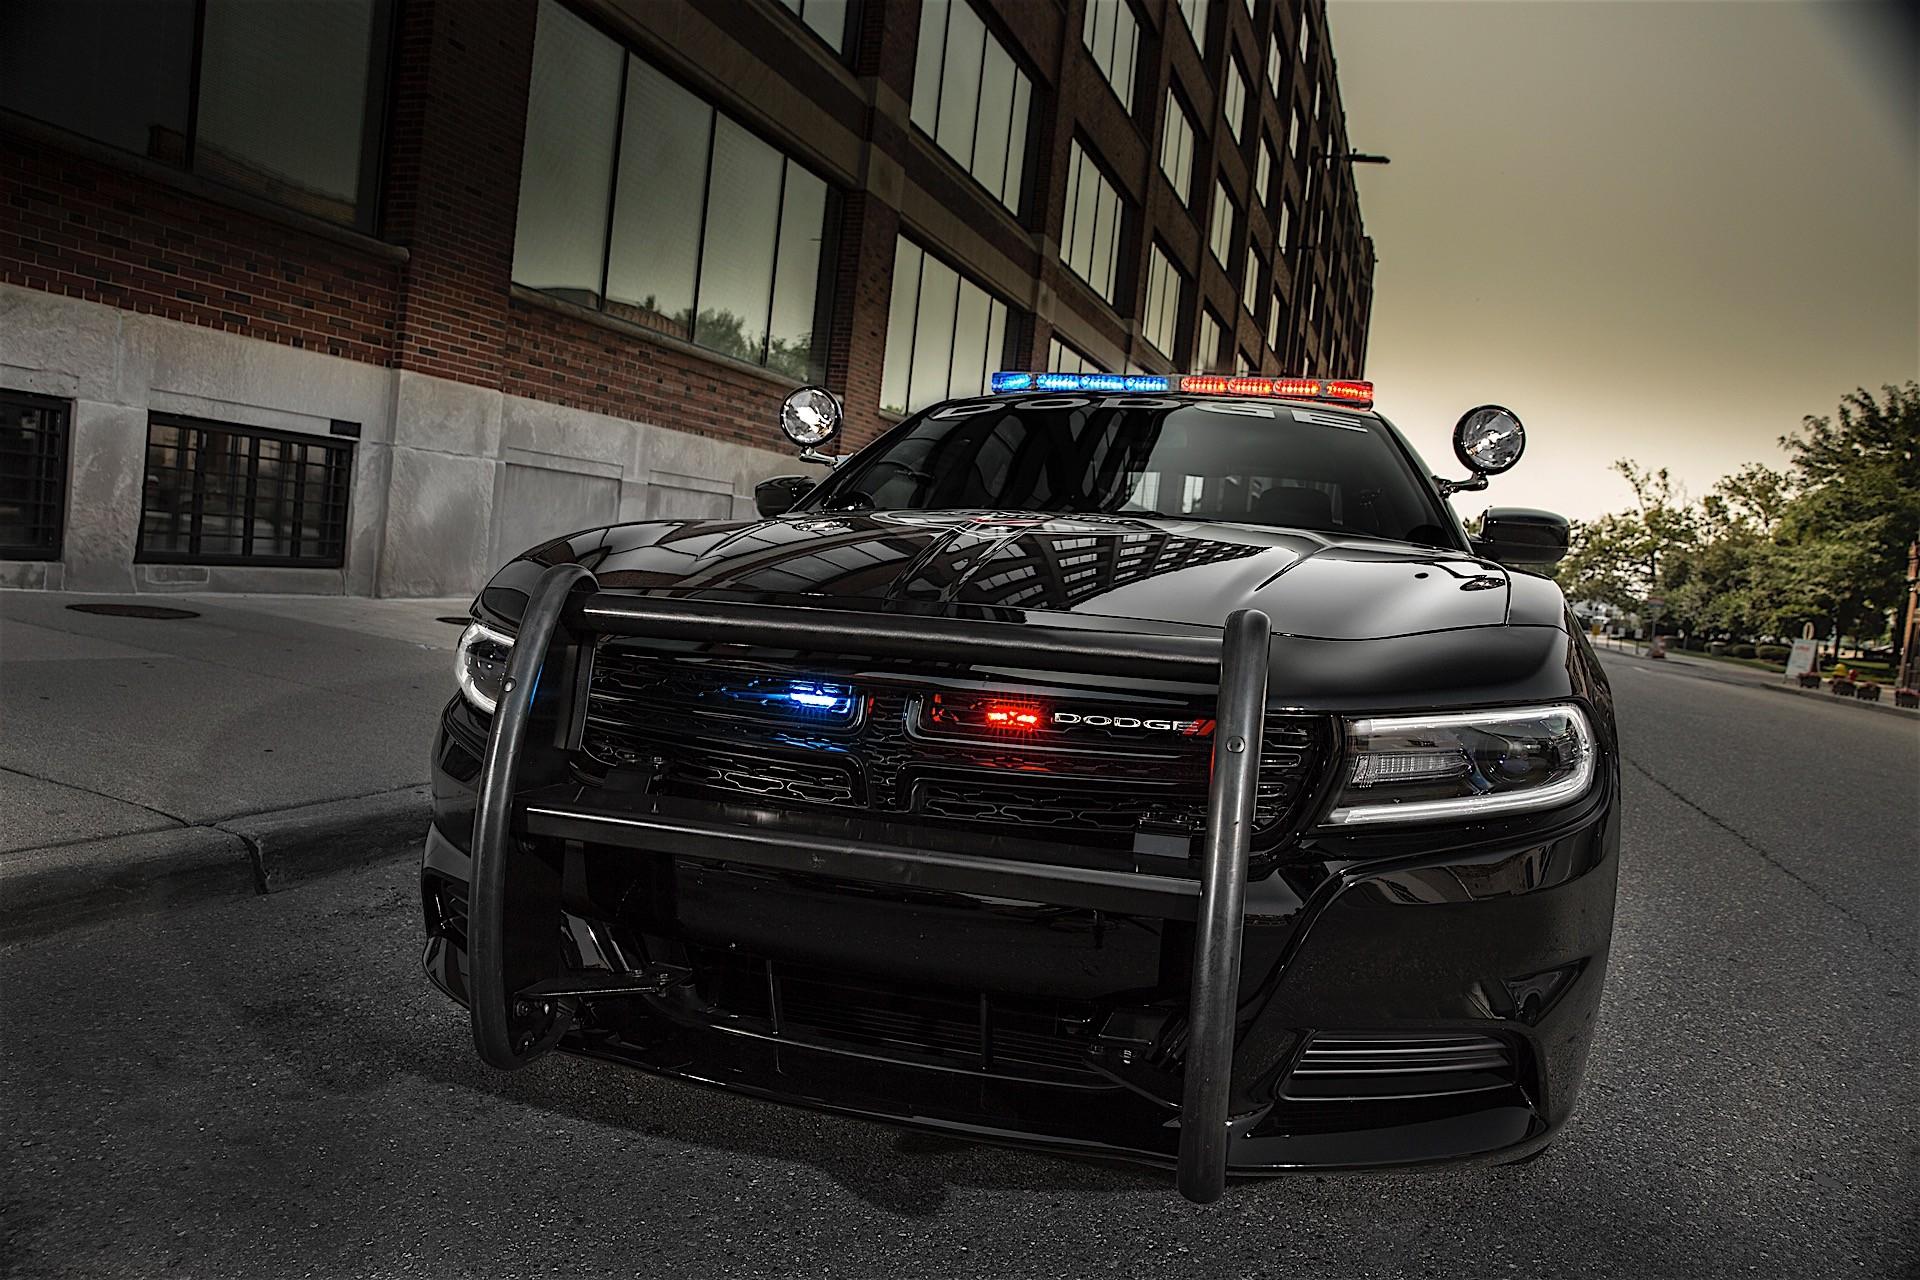 2016 Dodge Avenger >> California Highway Patrol Introduces Fleet of Dodge Charger Pursuit Vehicles - autoevolution